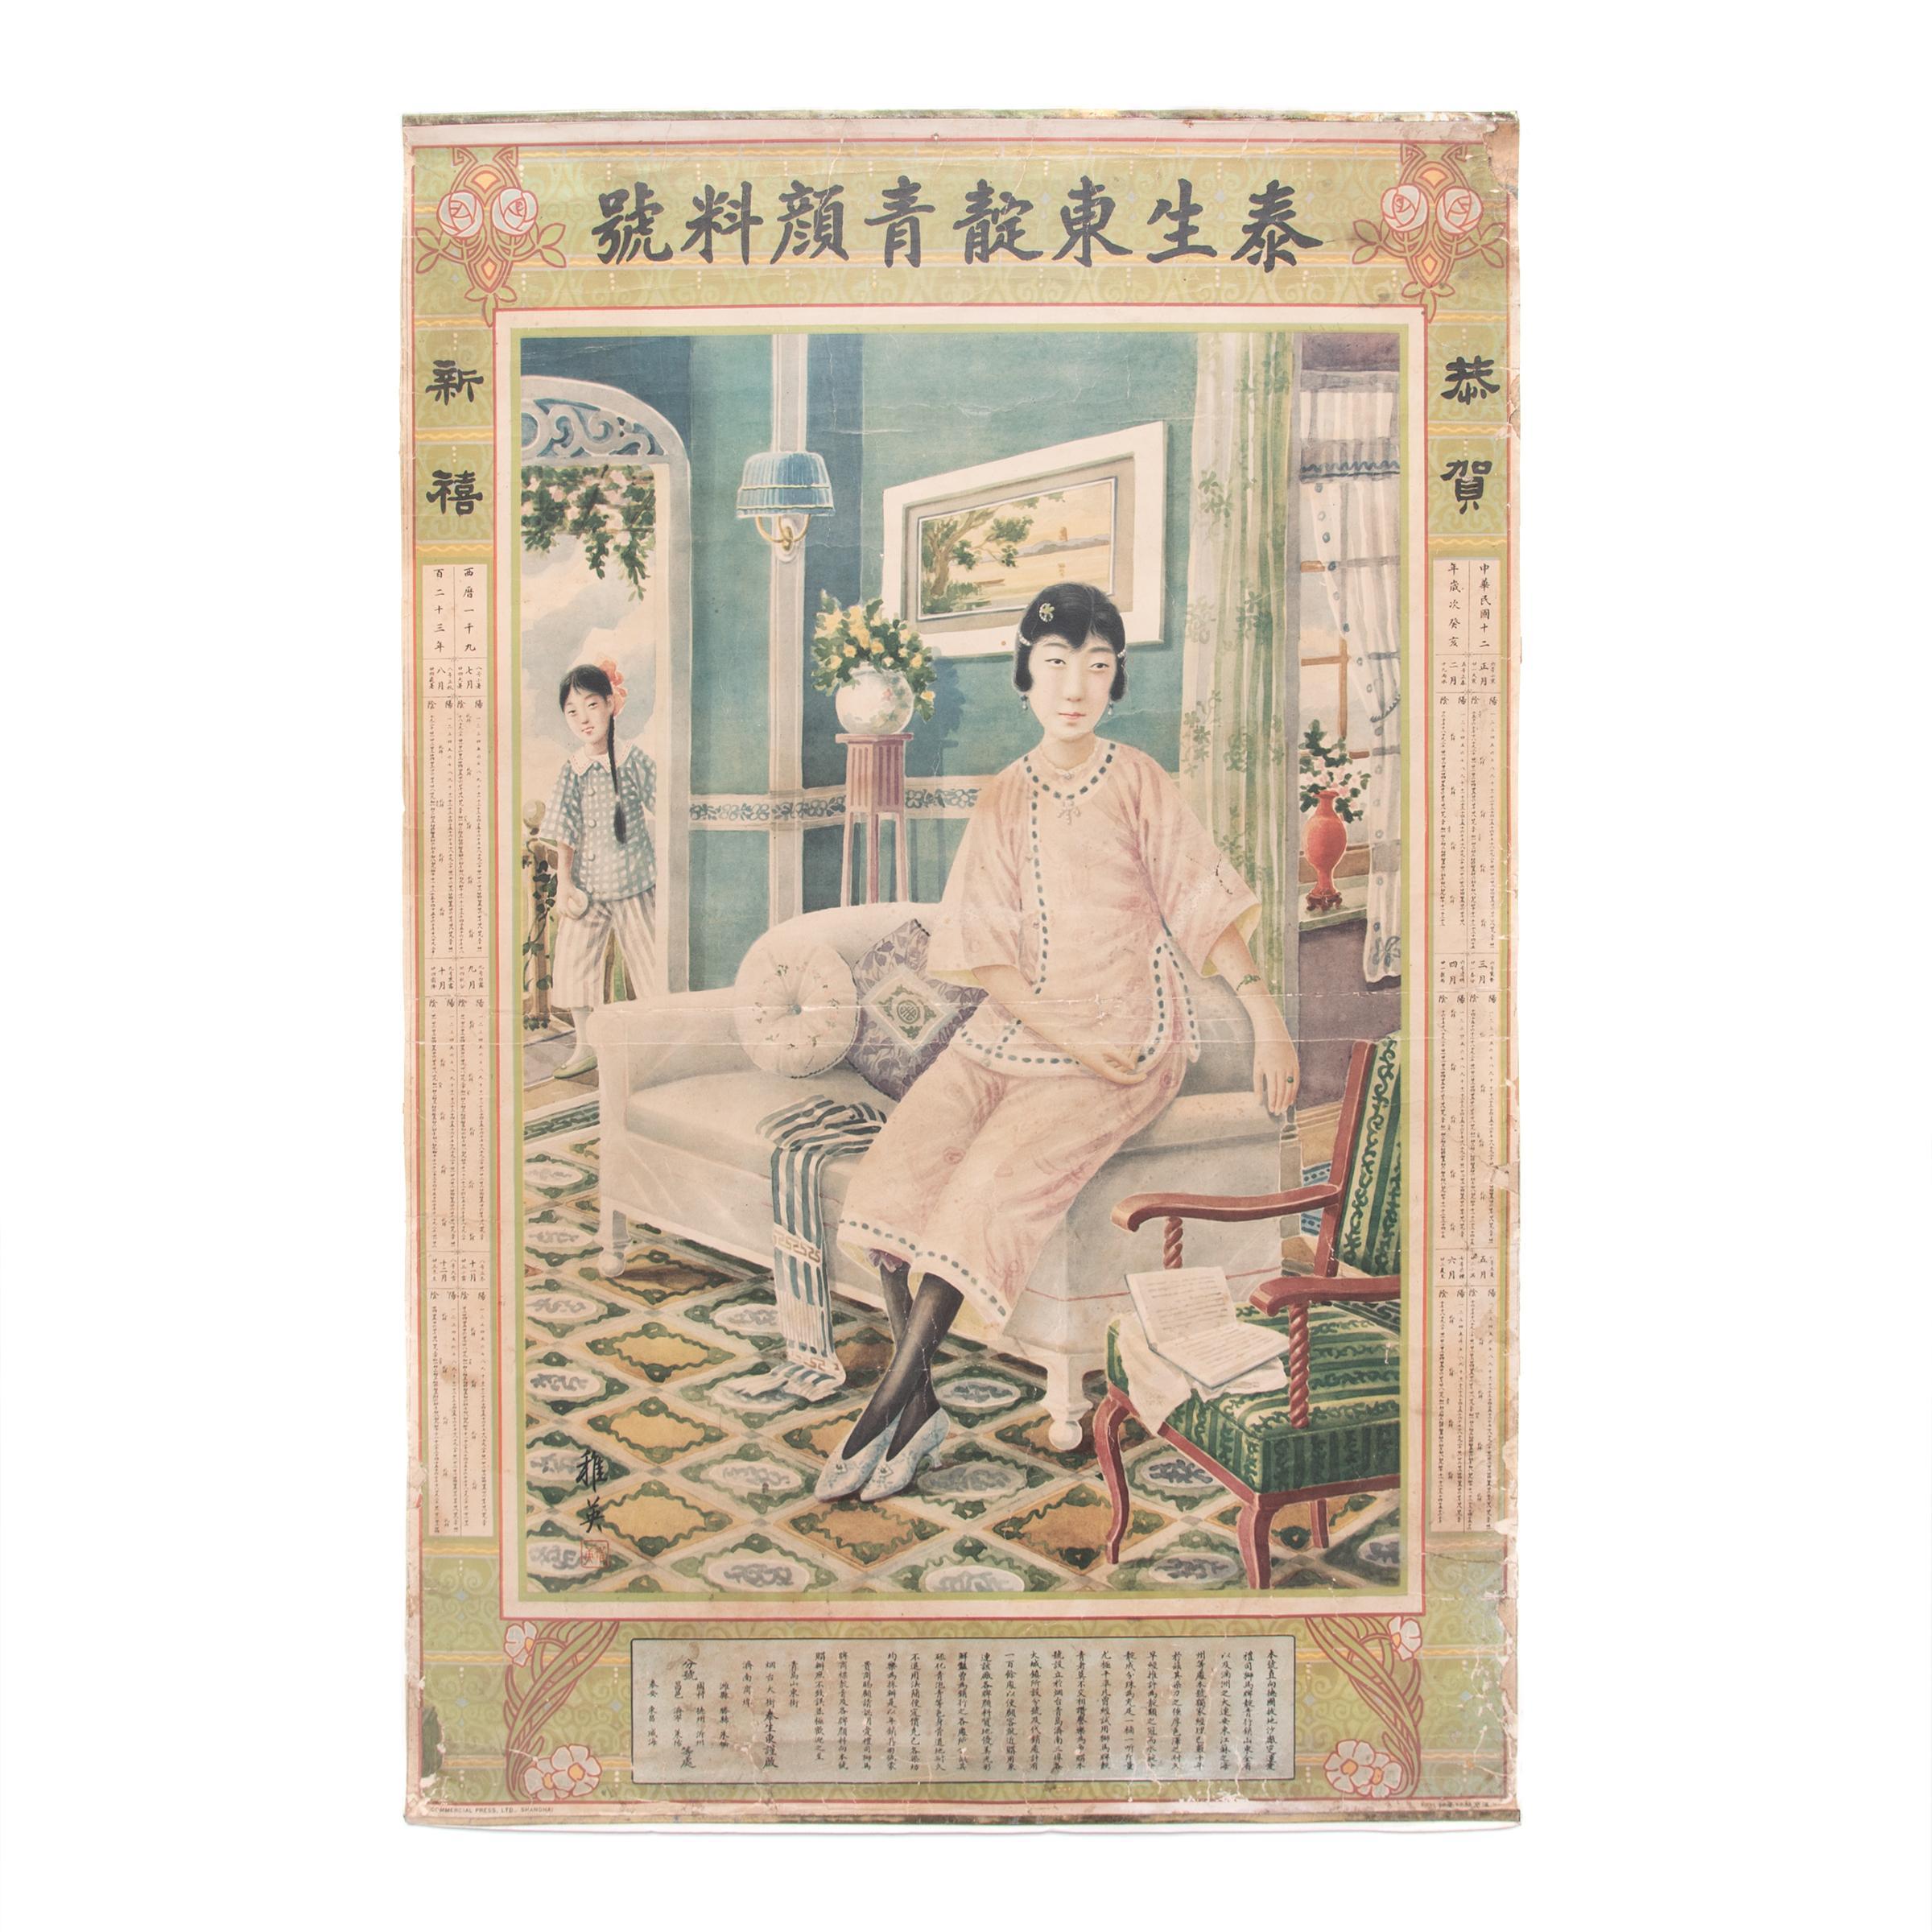 Vintage Chinese Calendar Advertisement Poster